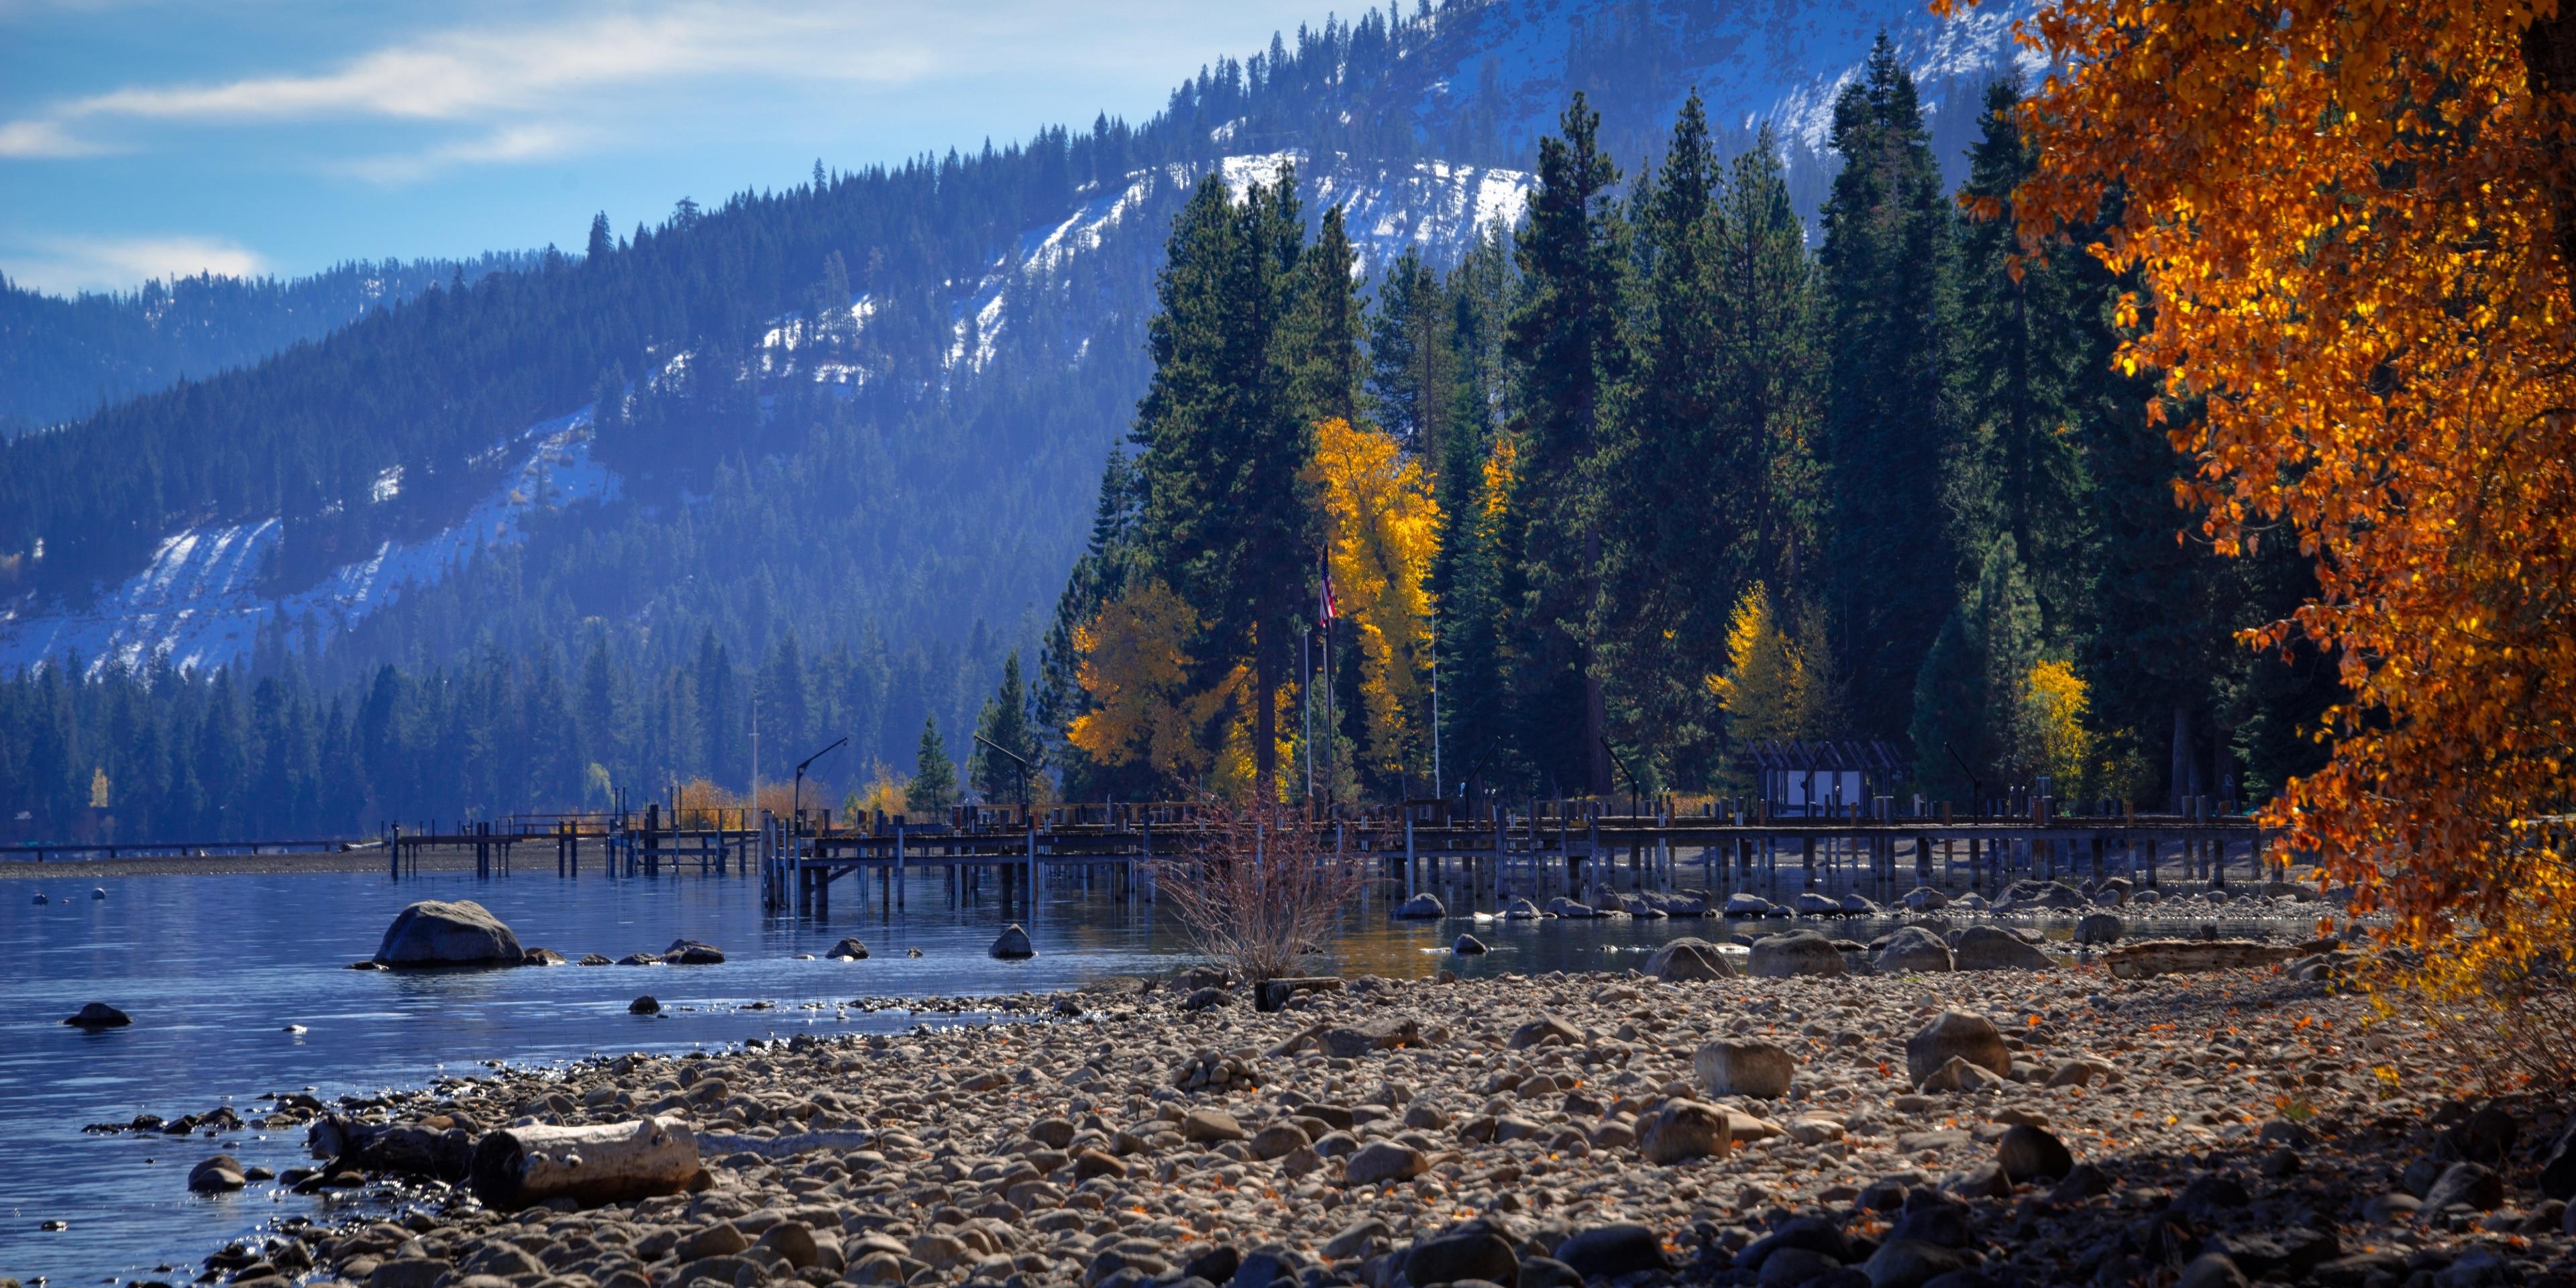 Mountain View, California, United States of America